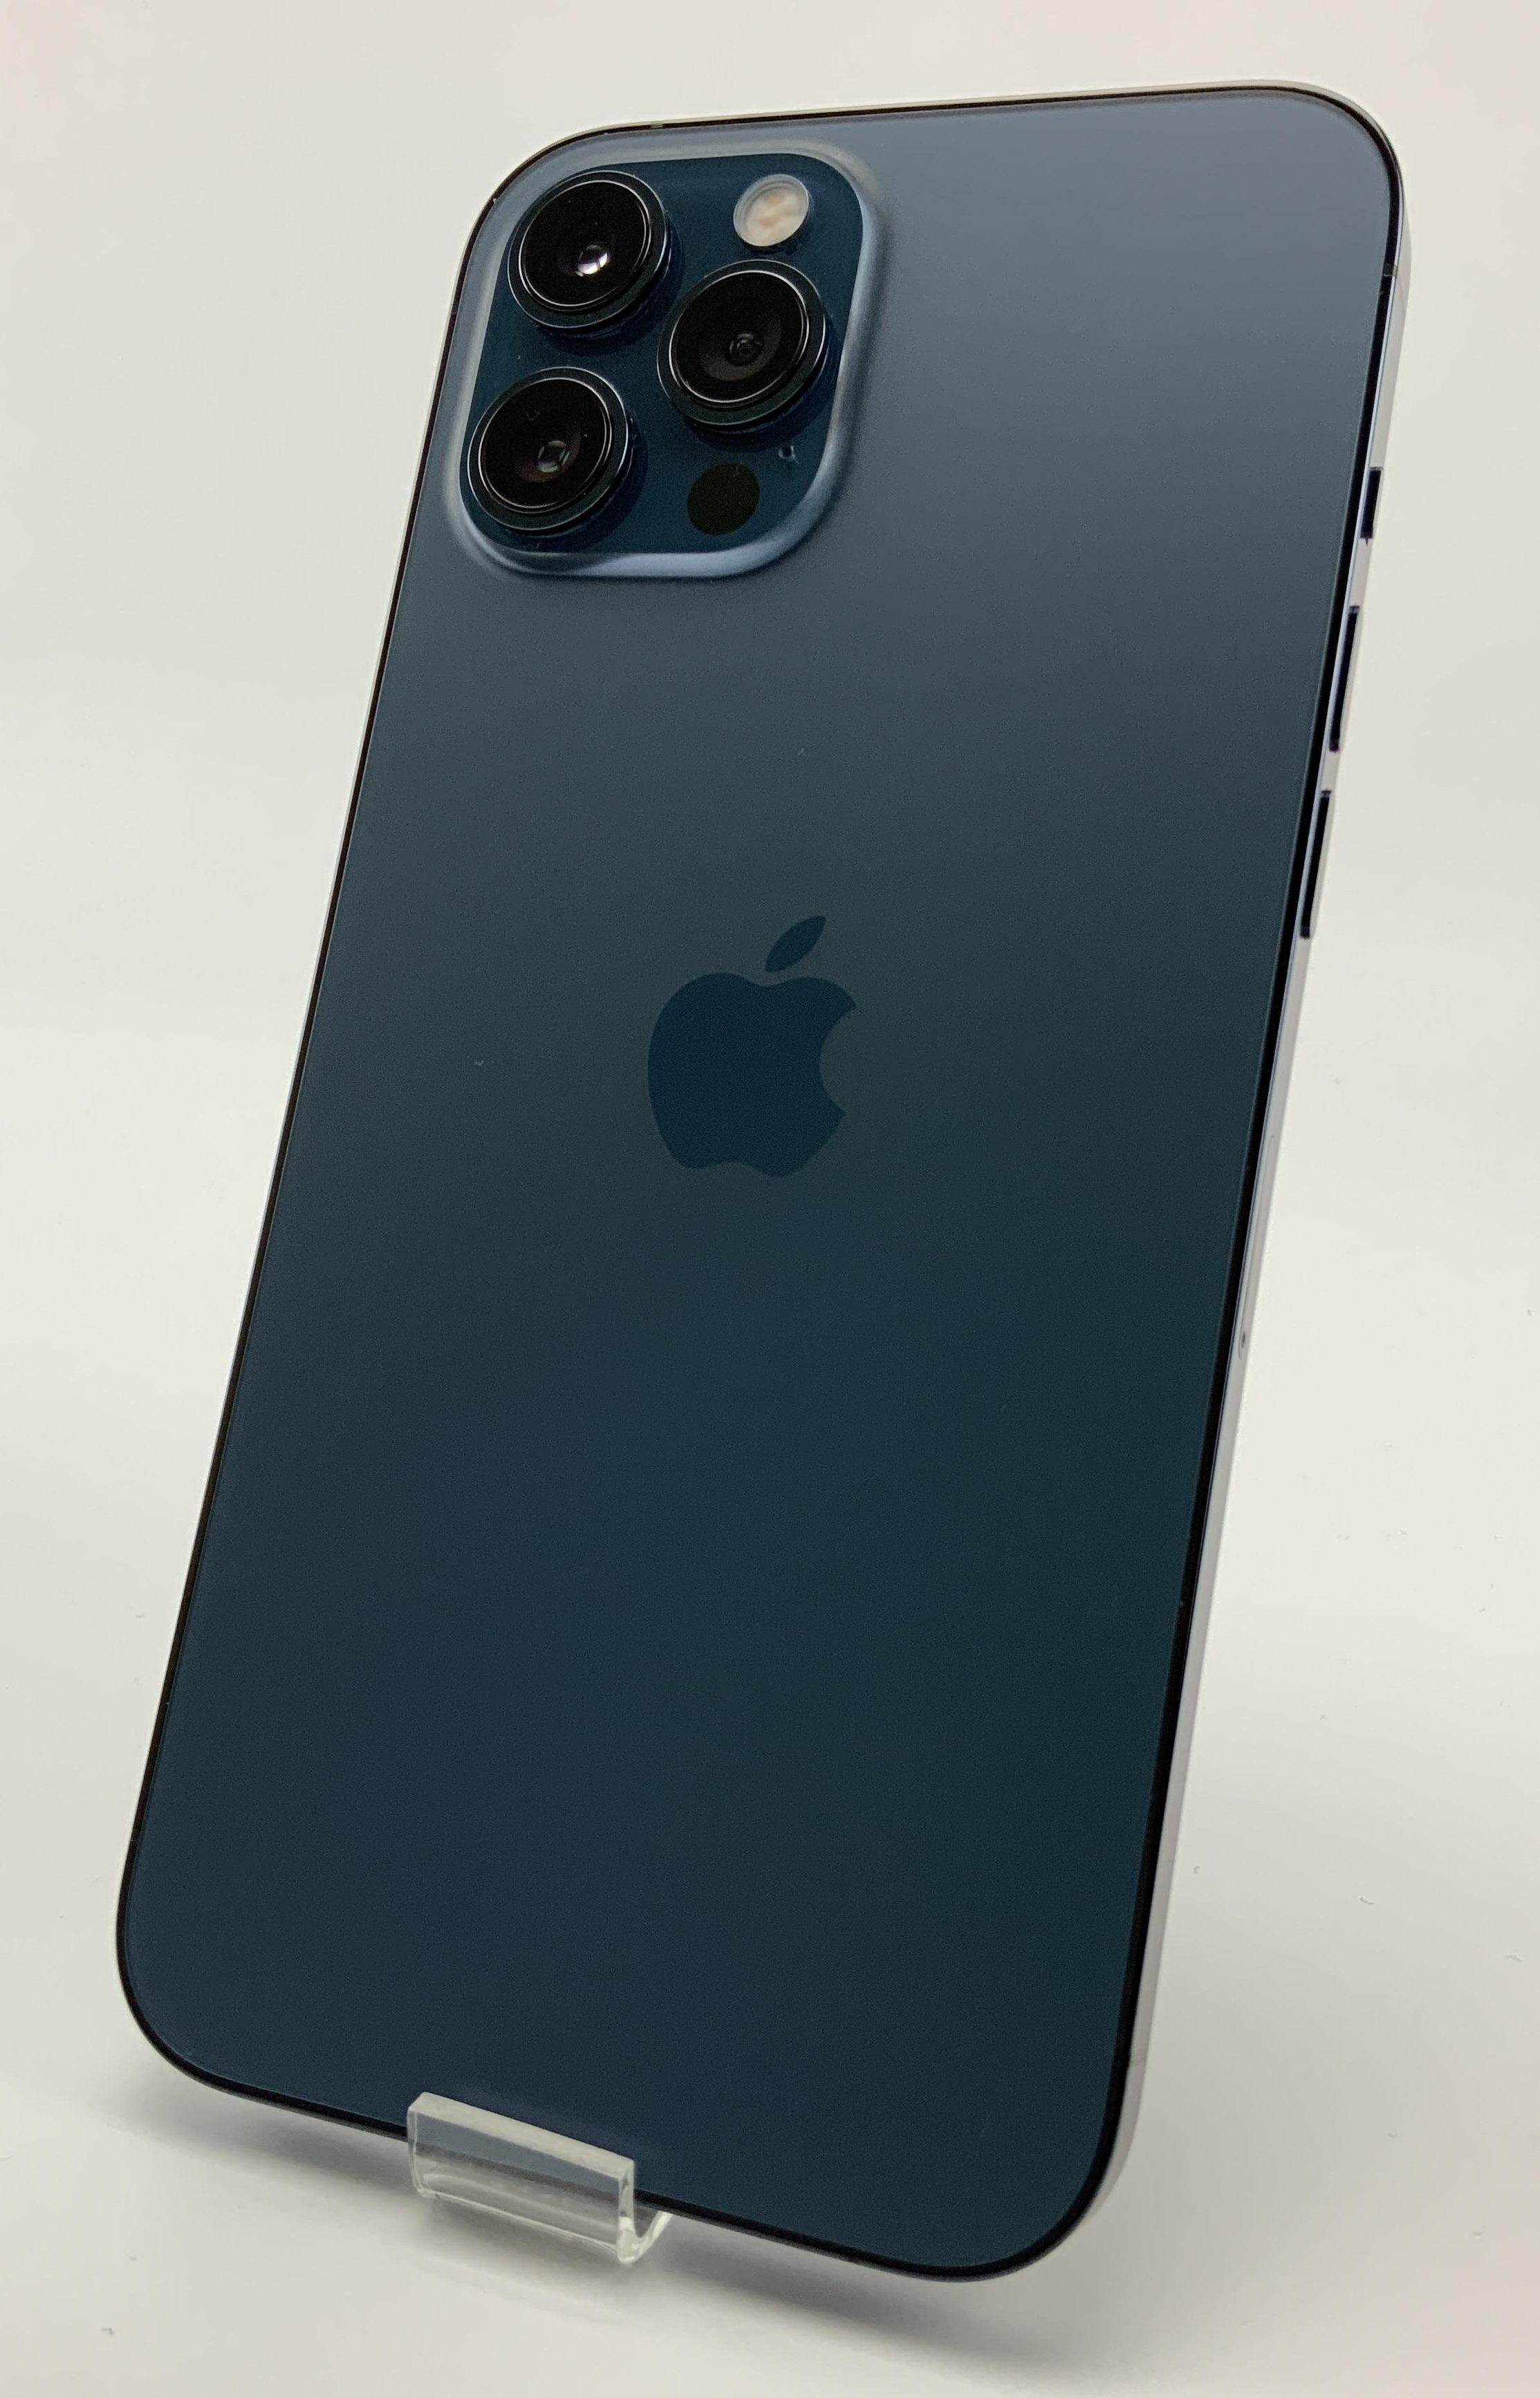 iPhone 12 Pro Max 256GB, 256GB, Pacific Blue, image 2